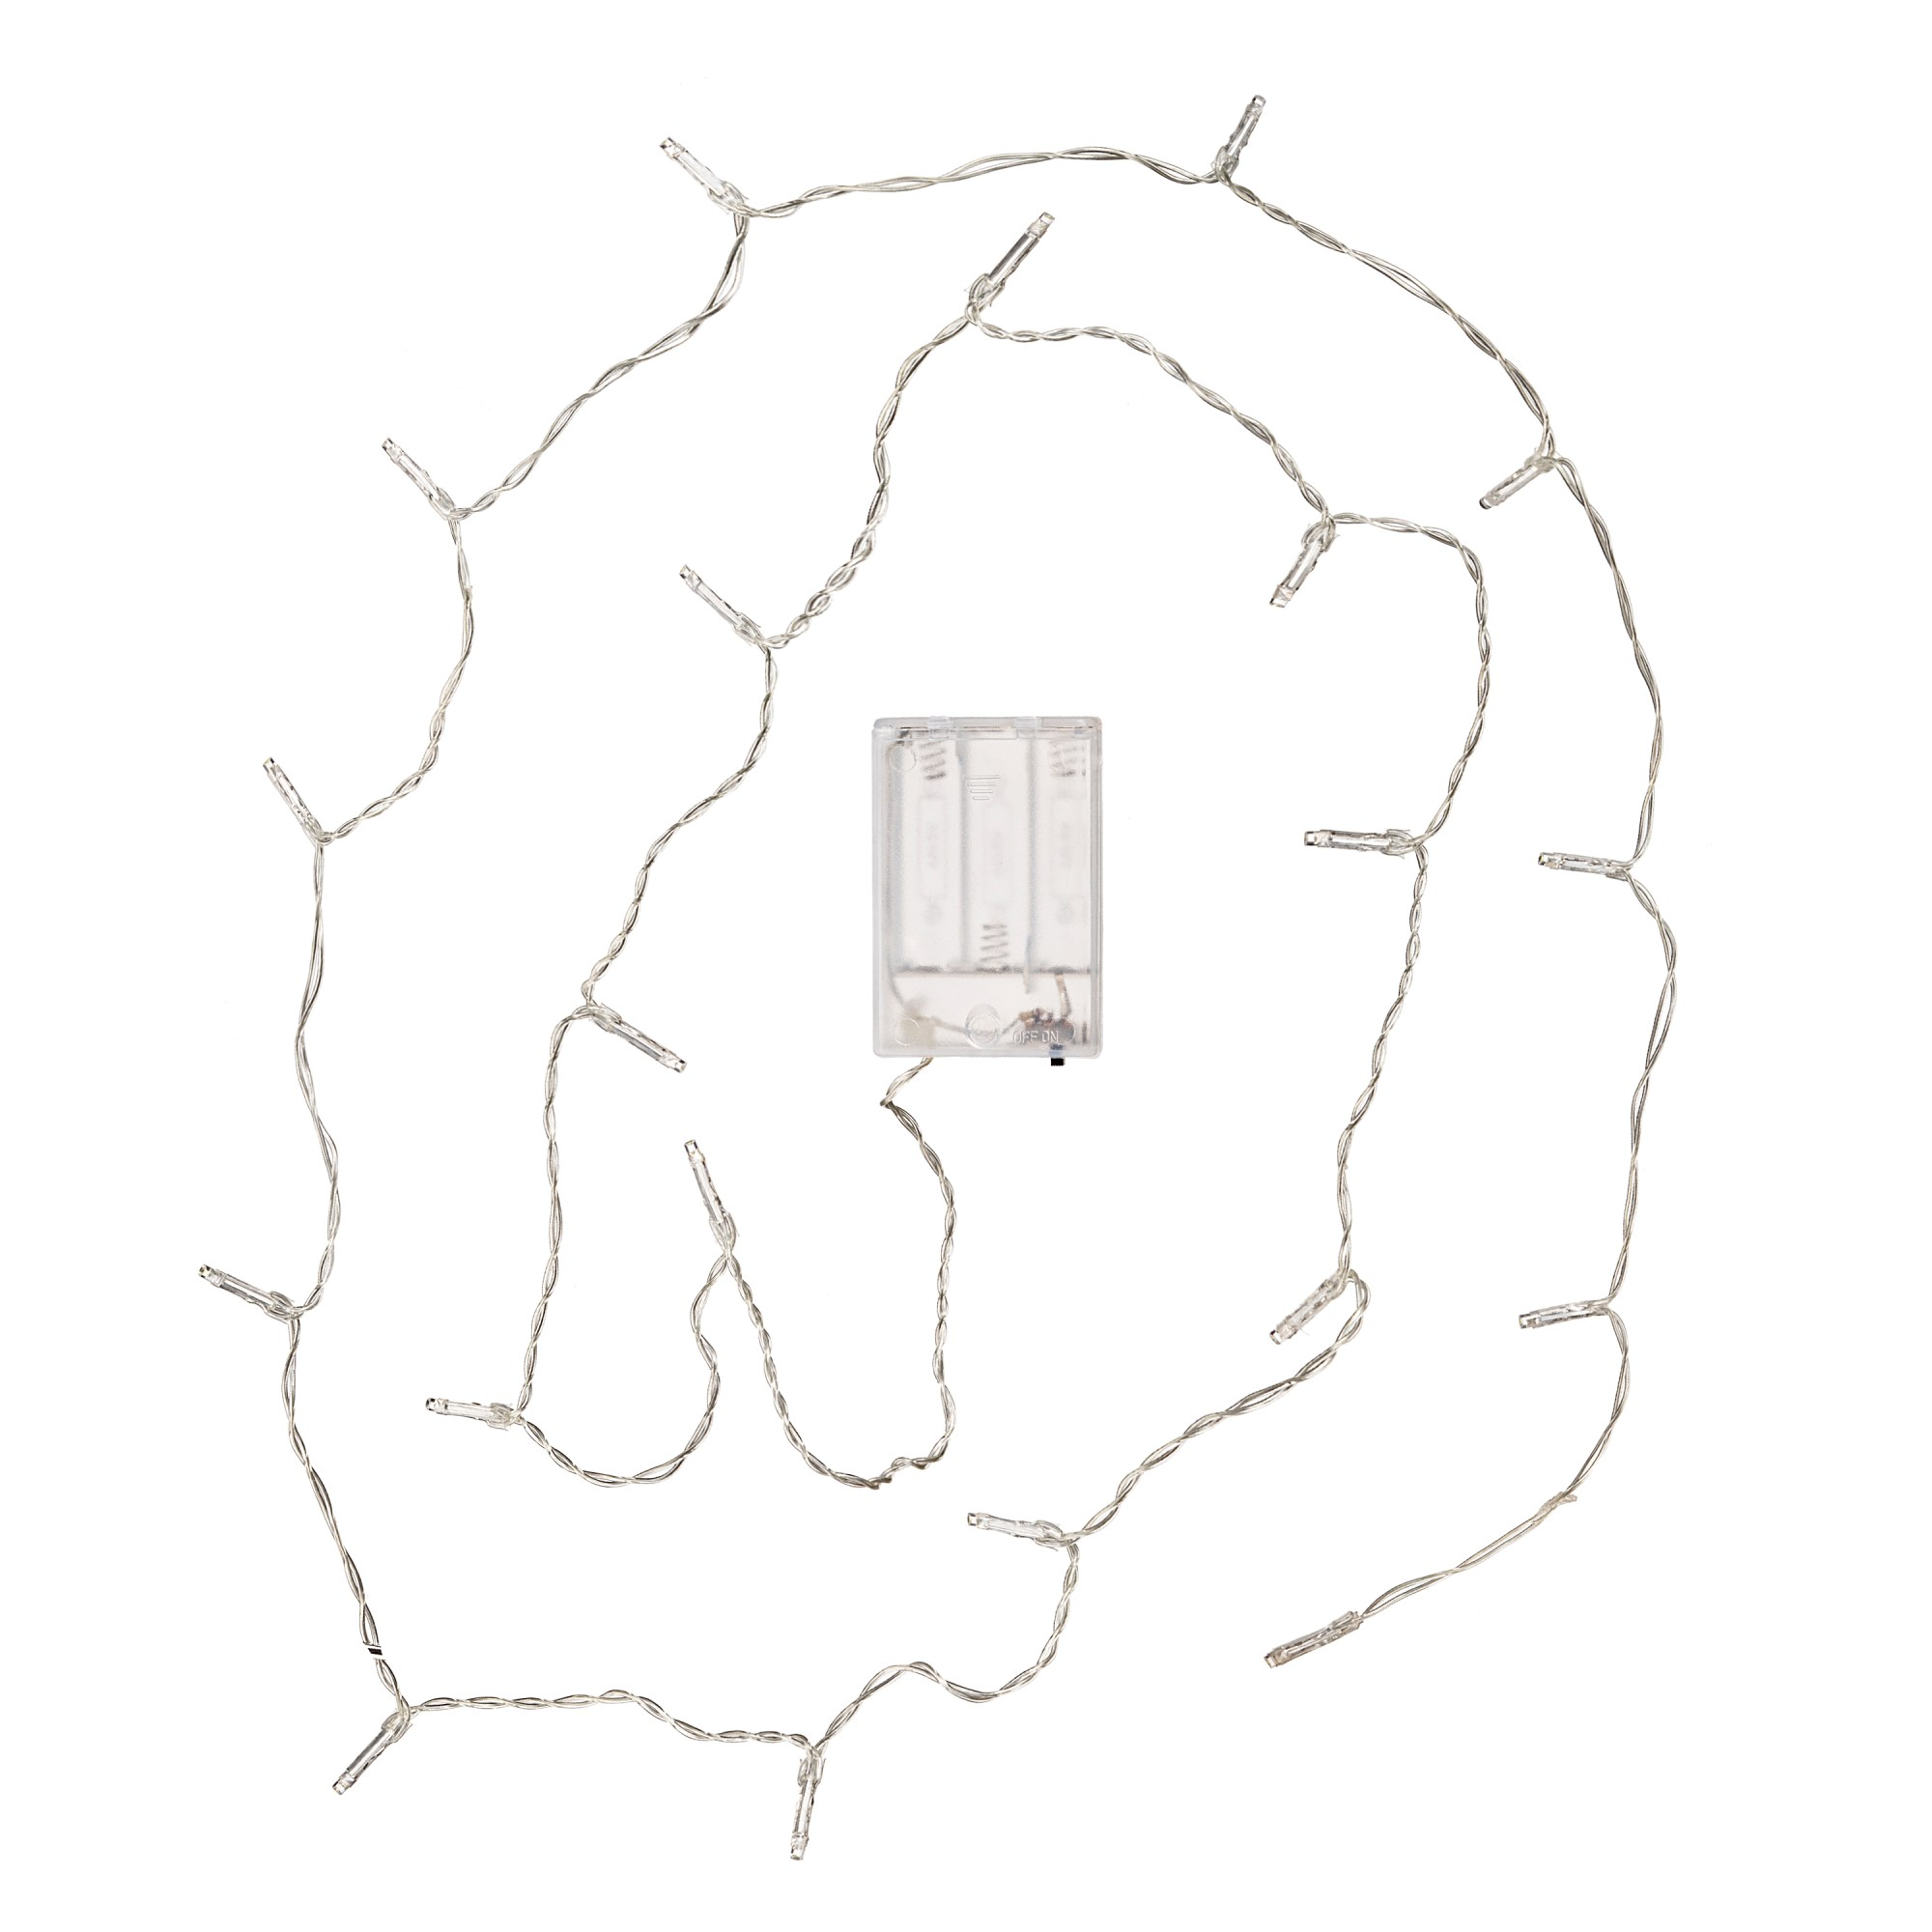 hight resolution of sodium vapor fixture wiring diagram